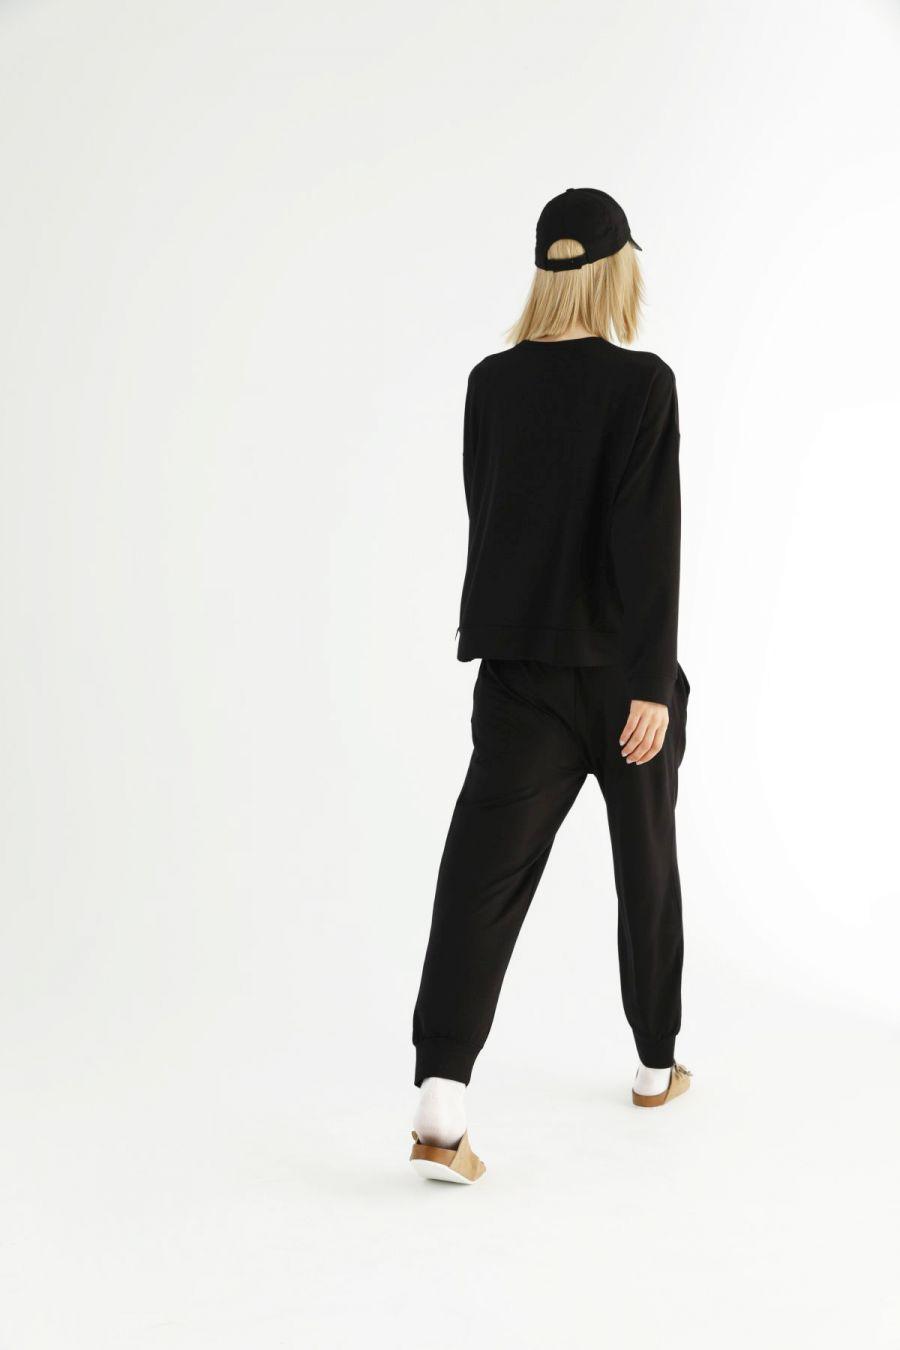 Siyah Cepli Eşofman-Sweatshirt Takım 21278021